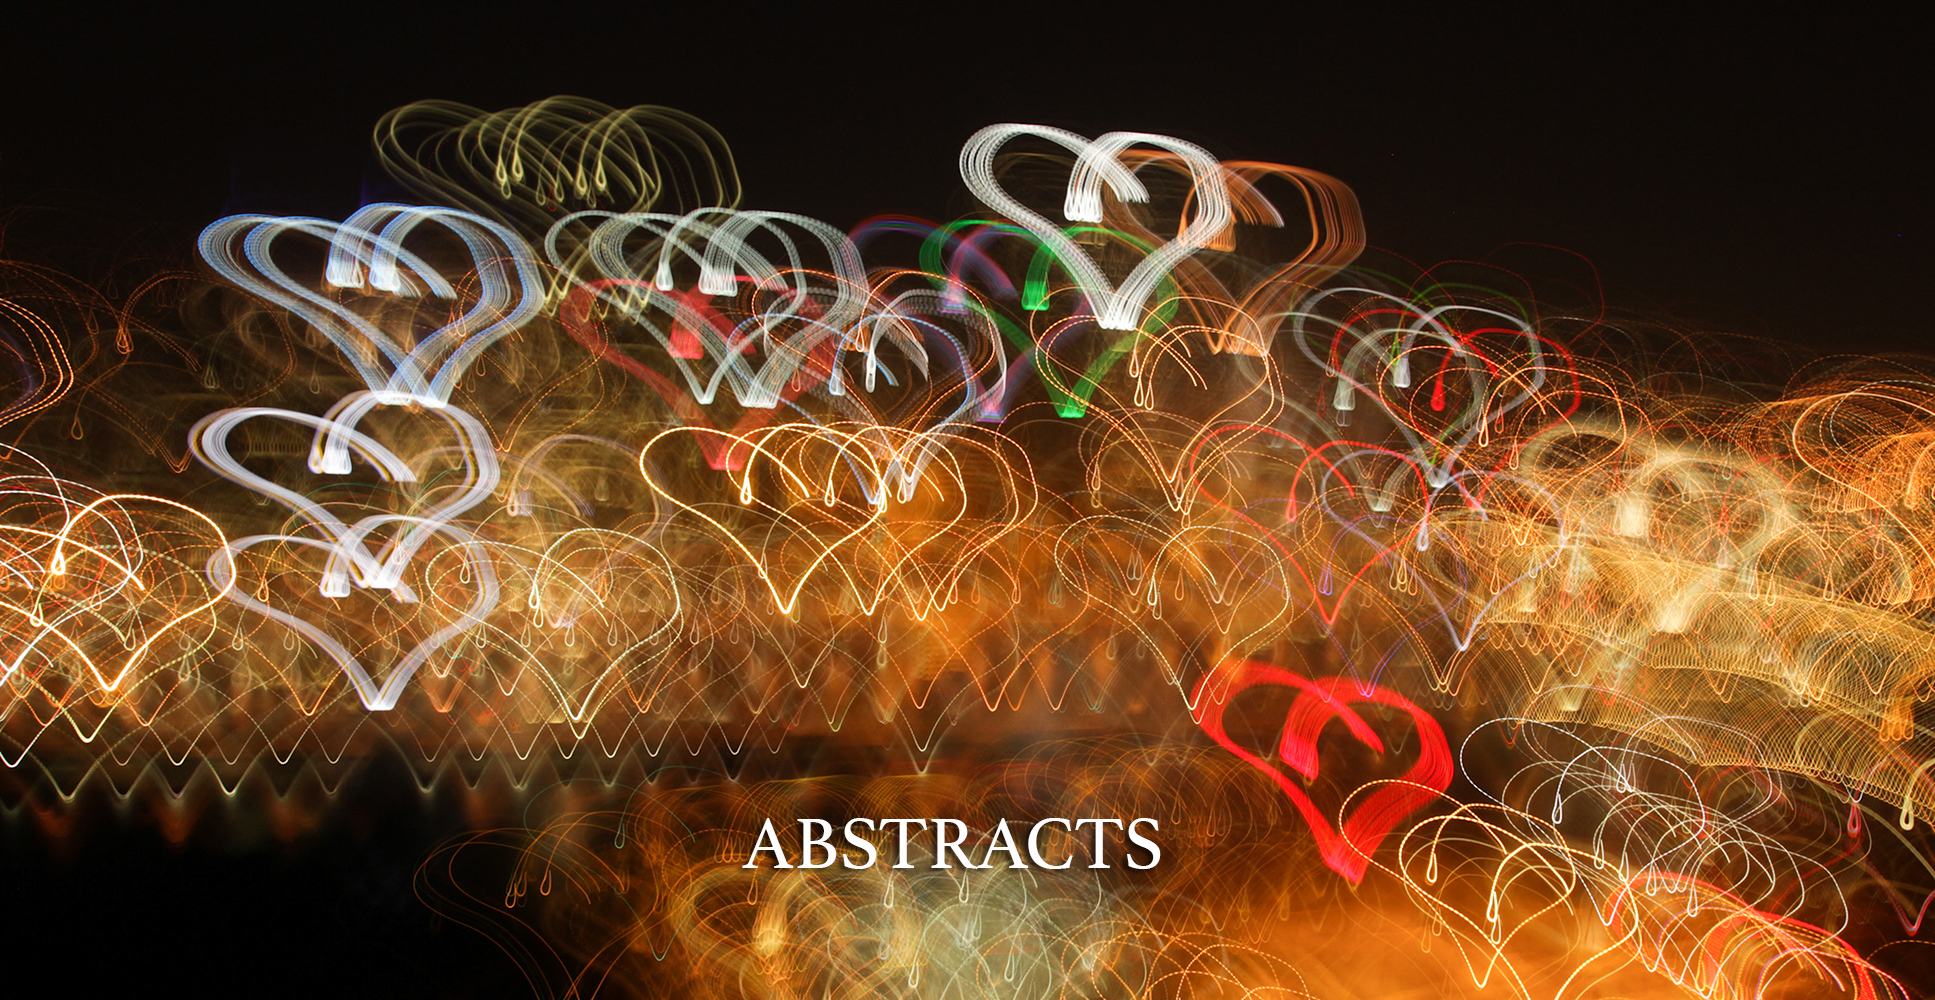 abstractsicon.jpg